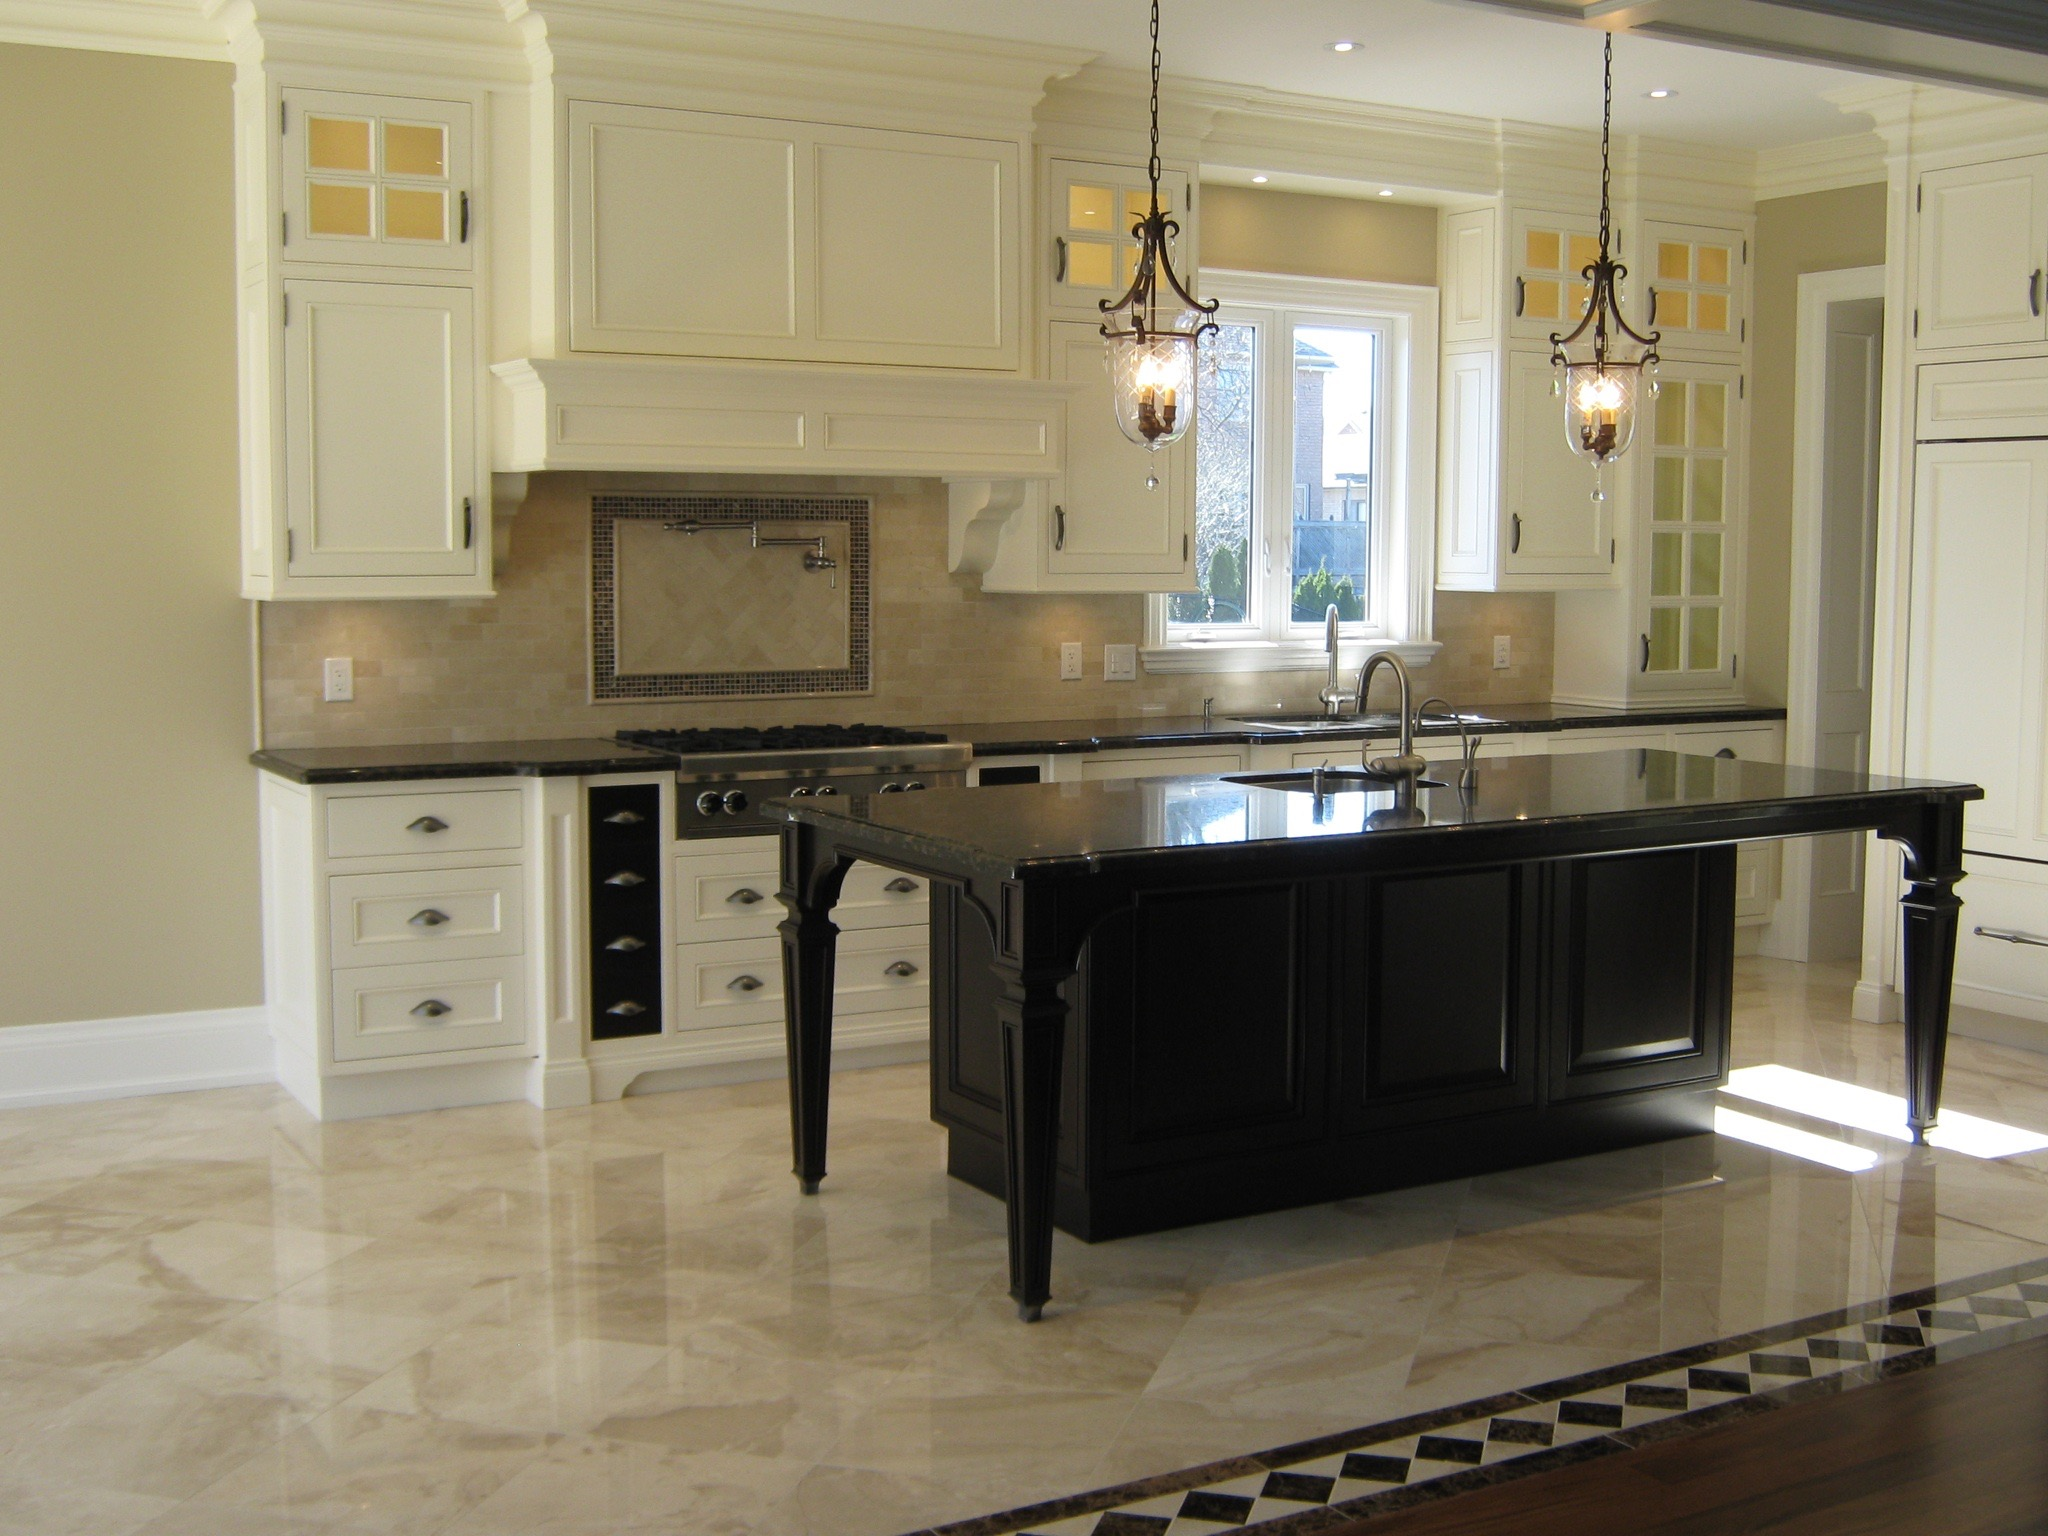 Kitchen Floor & Backsplash Done Right!